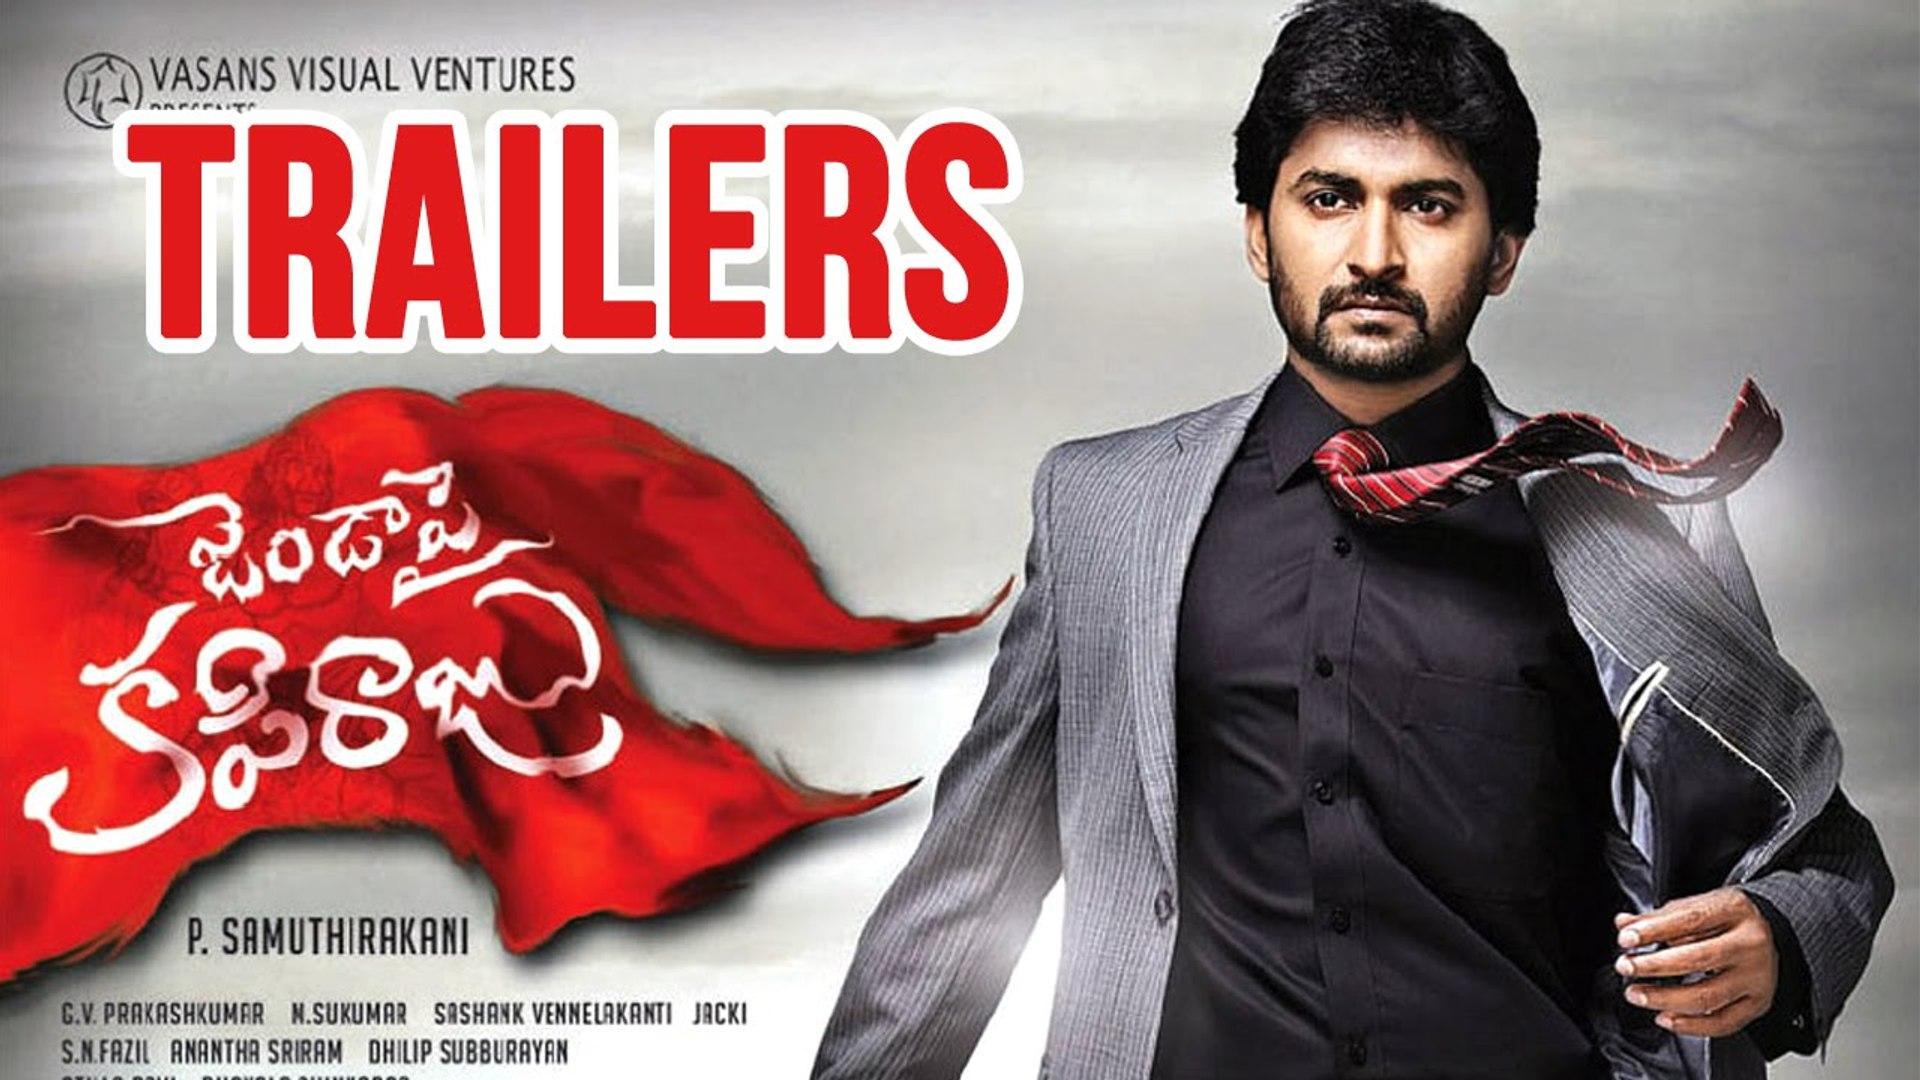 Janda Pai Kapiraju Back To Back Trailer Teaser Comedy Songs Telugu Movies Video Dailymotion